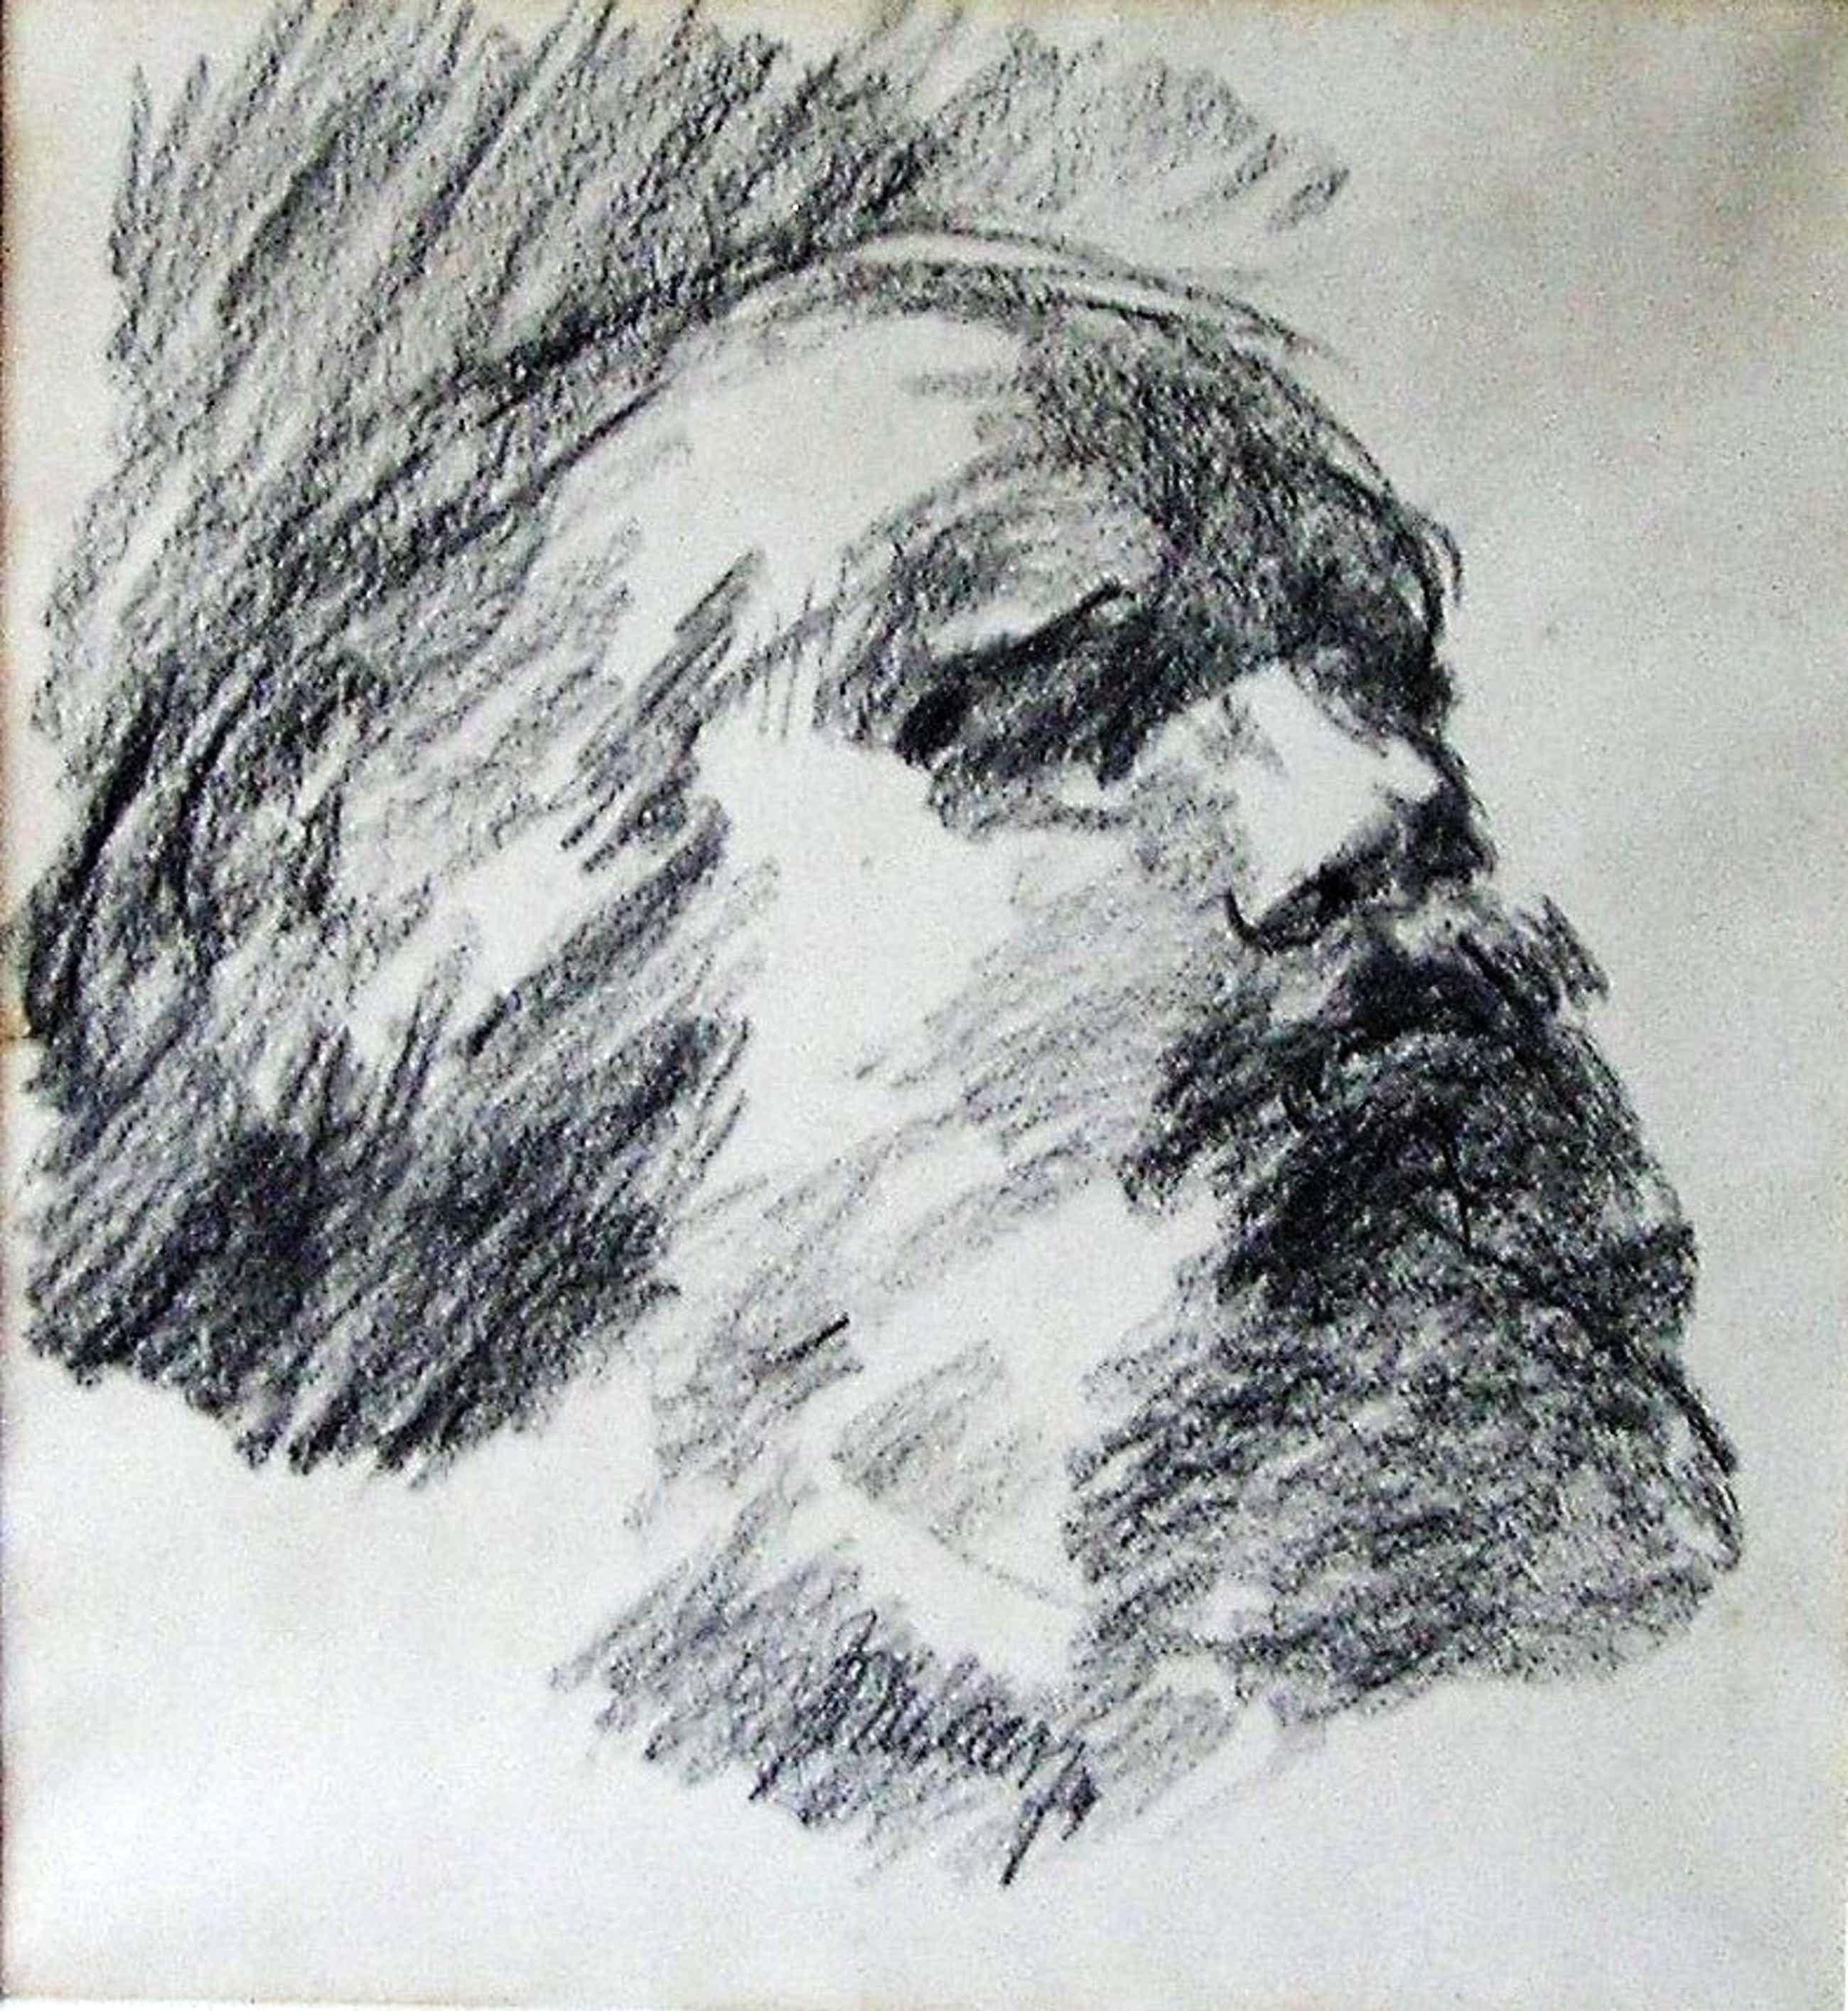 Jo Maes - Portretstudie van Man met Baard, '74, Krijttekening kopen? Bied vanaf 15!